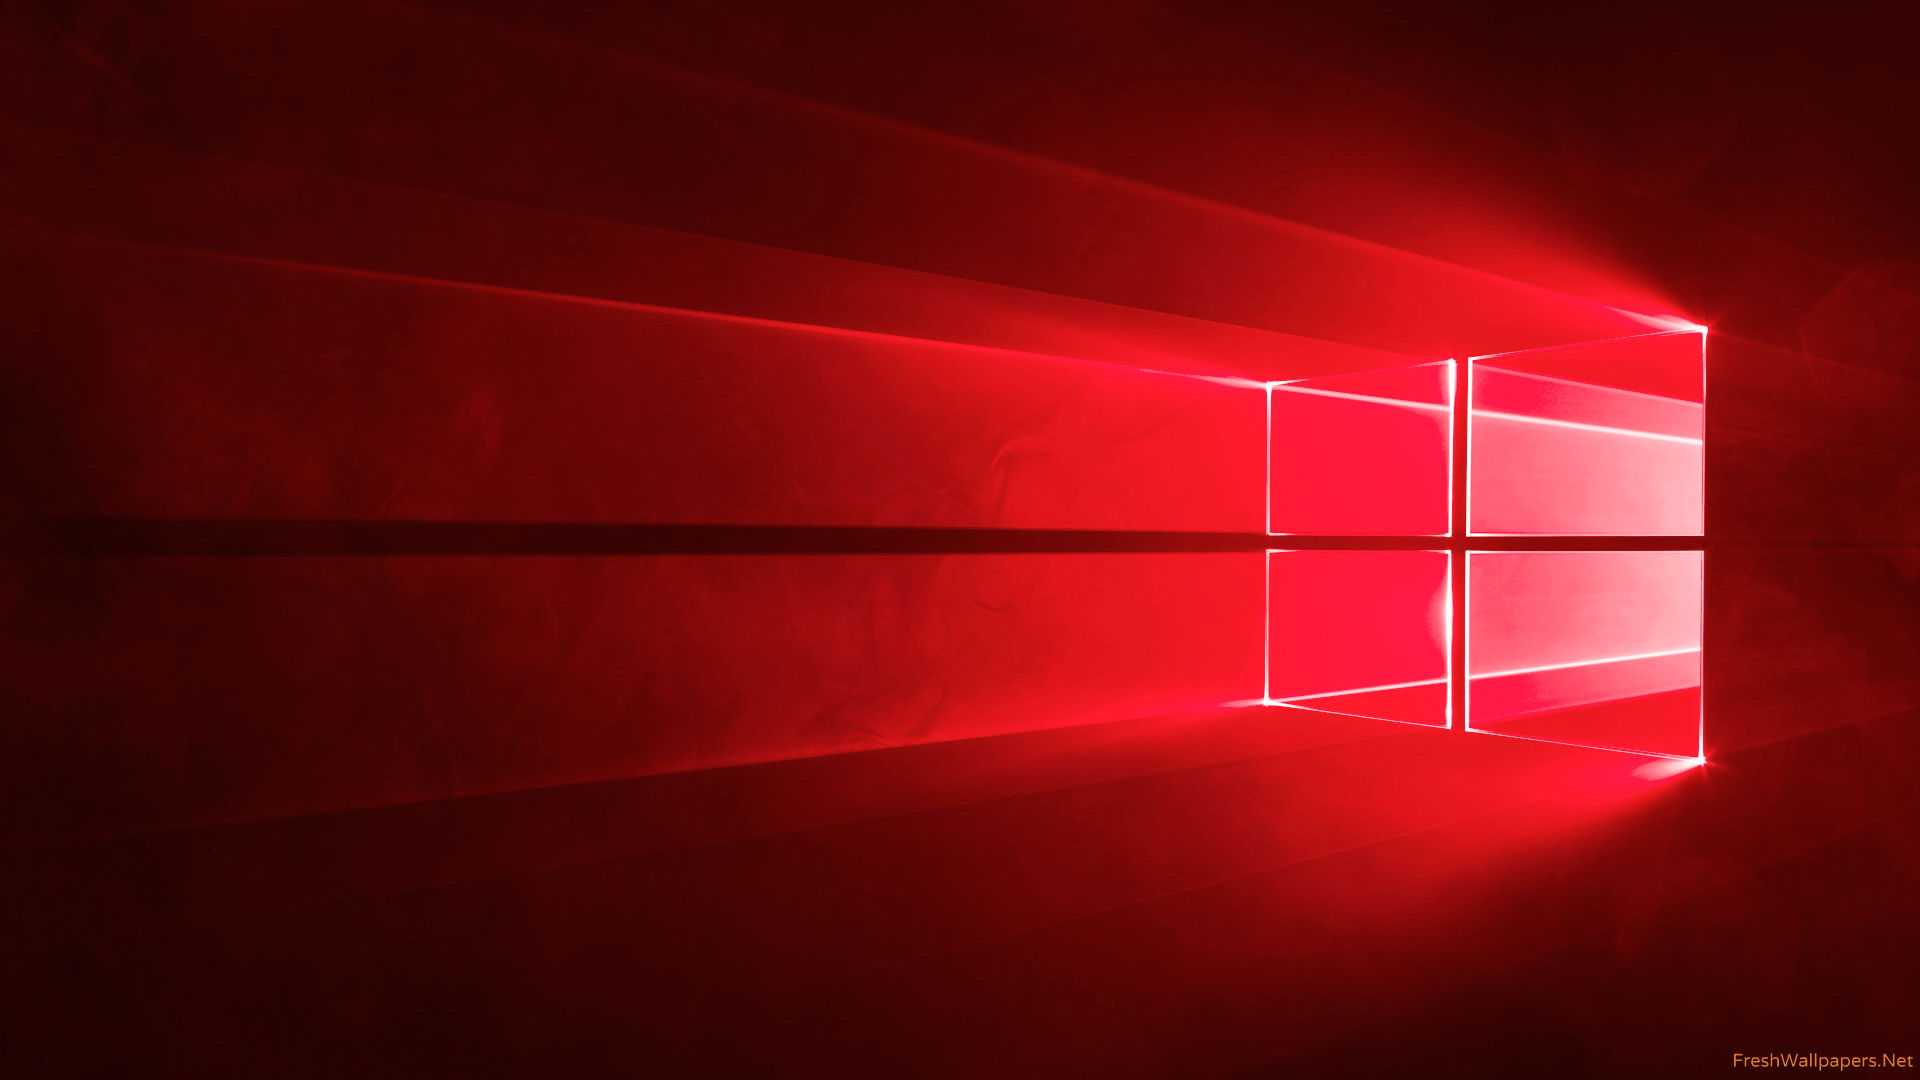 Windows 10 High Definition Wallpapers WallpaperSafari